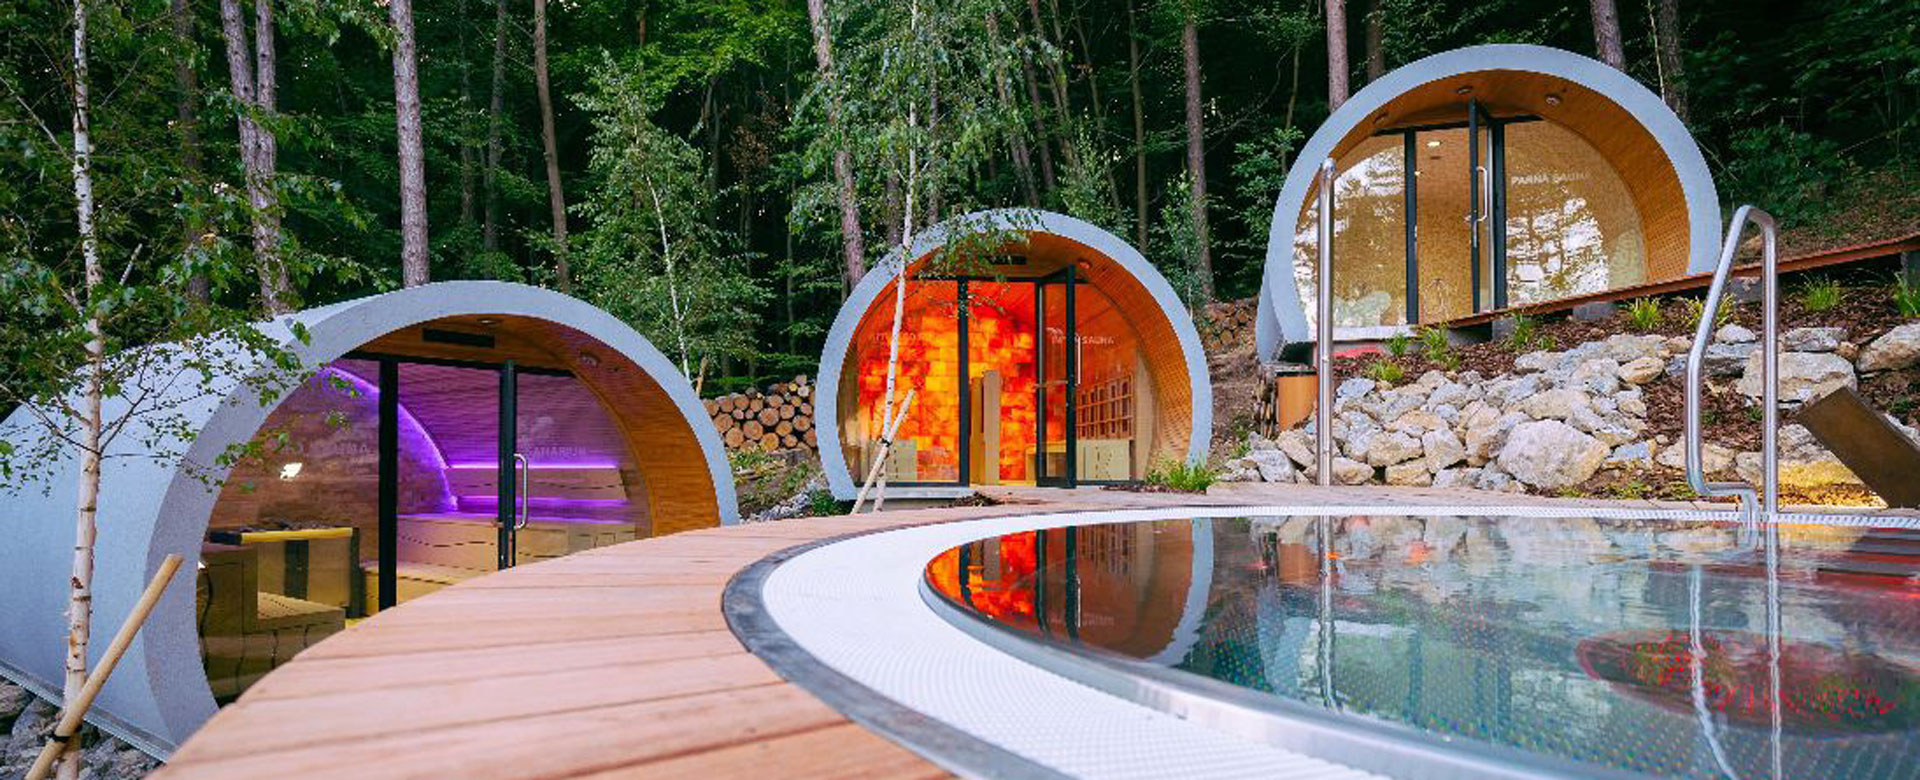 Gamme sauna Alpha